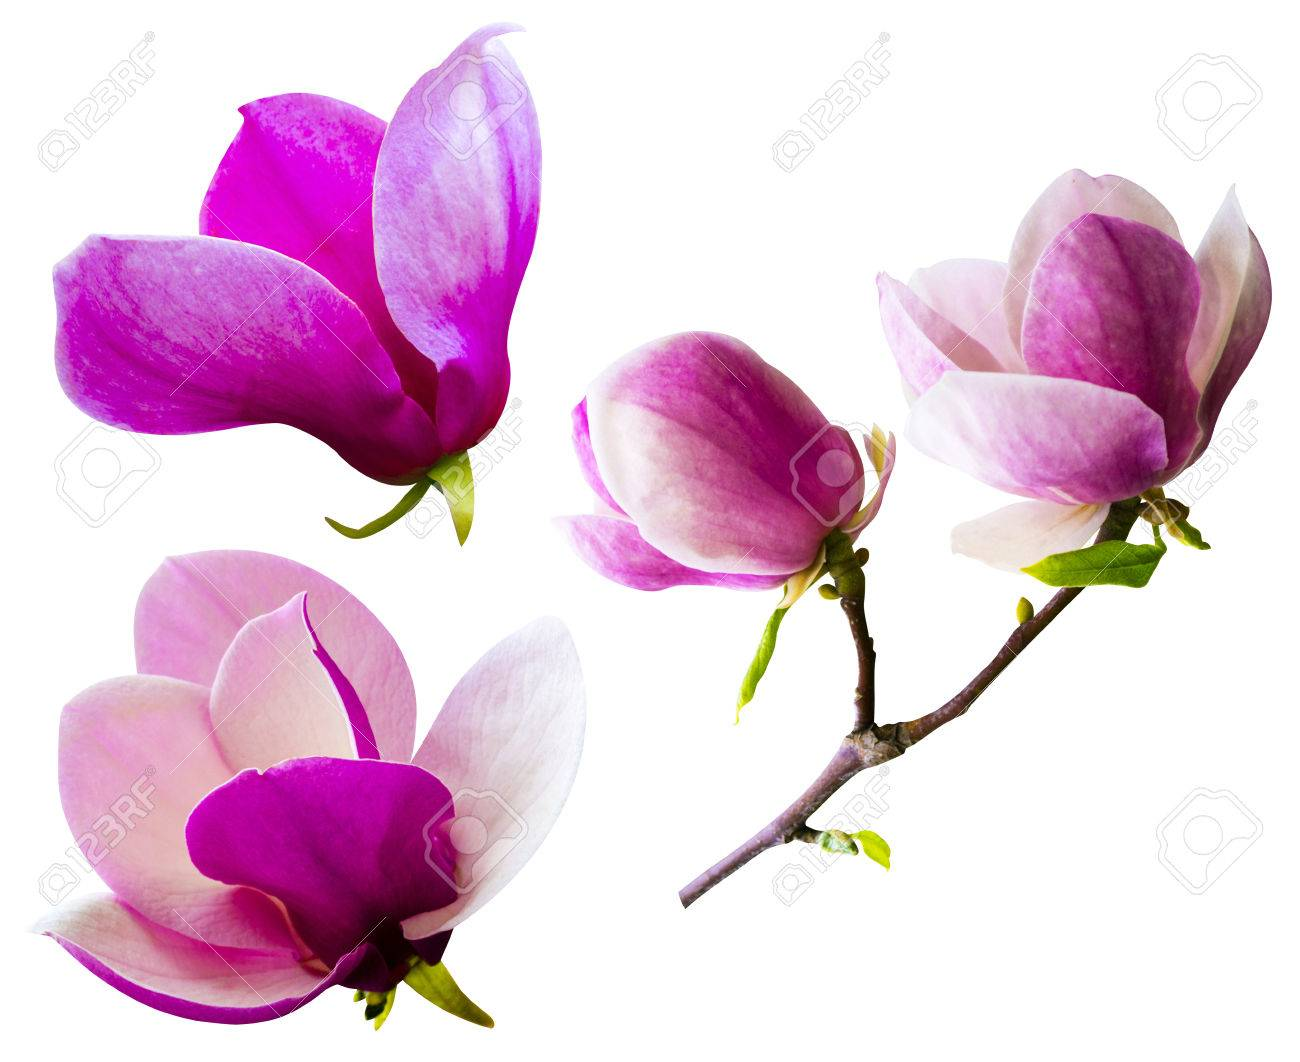 Decoration Of Few Magnolia Flowers Pink Magnolia Flower Isolated